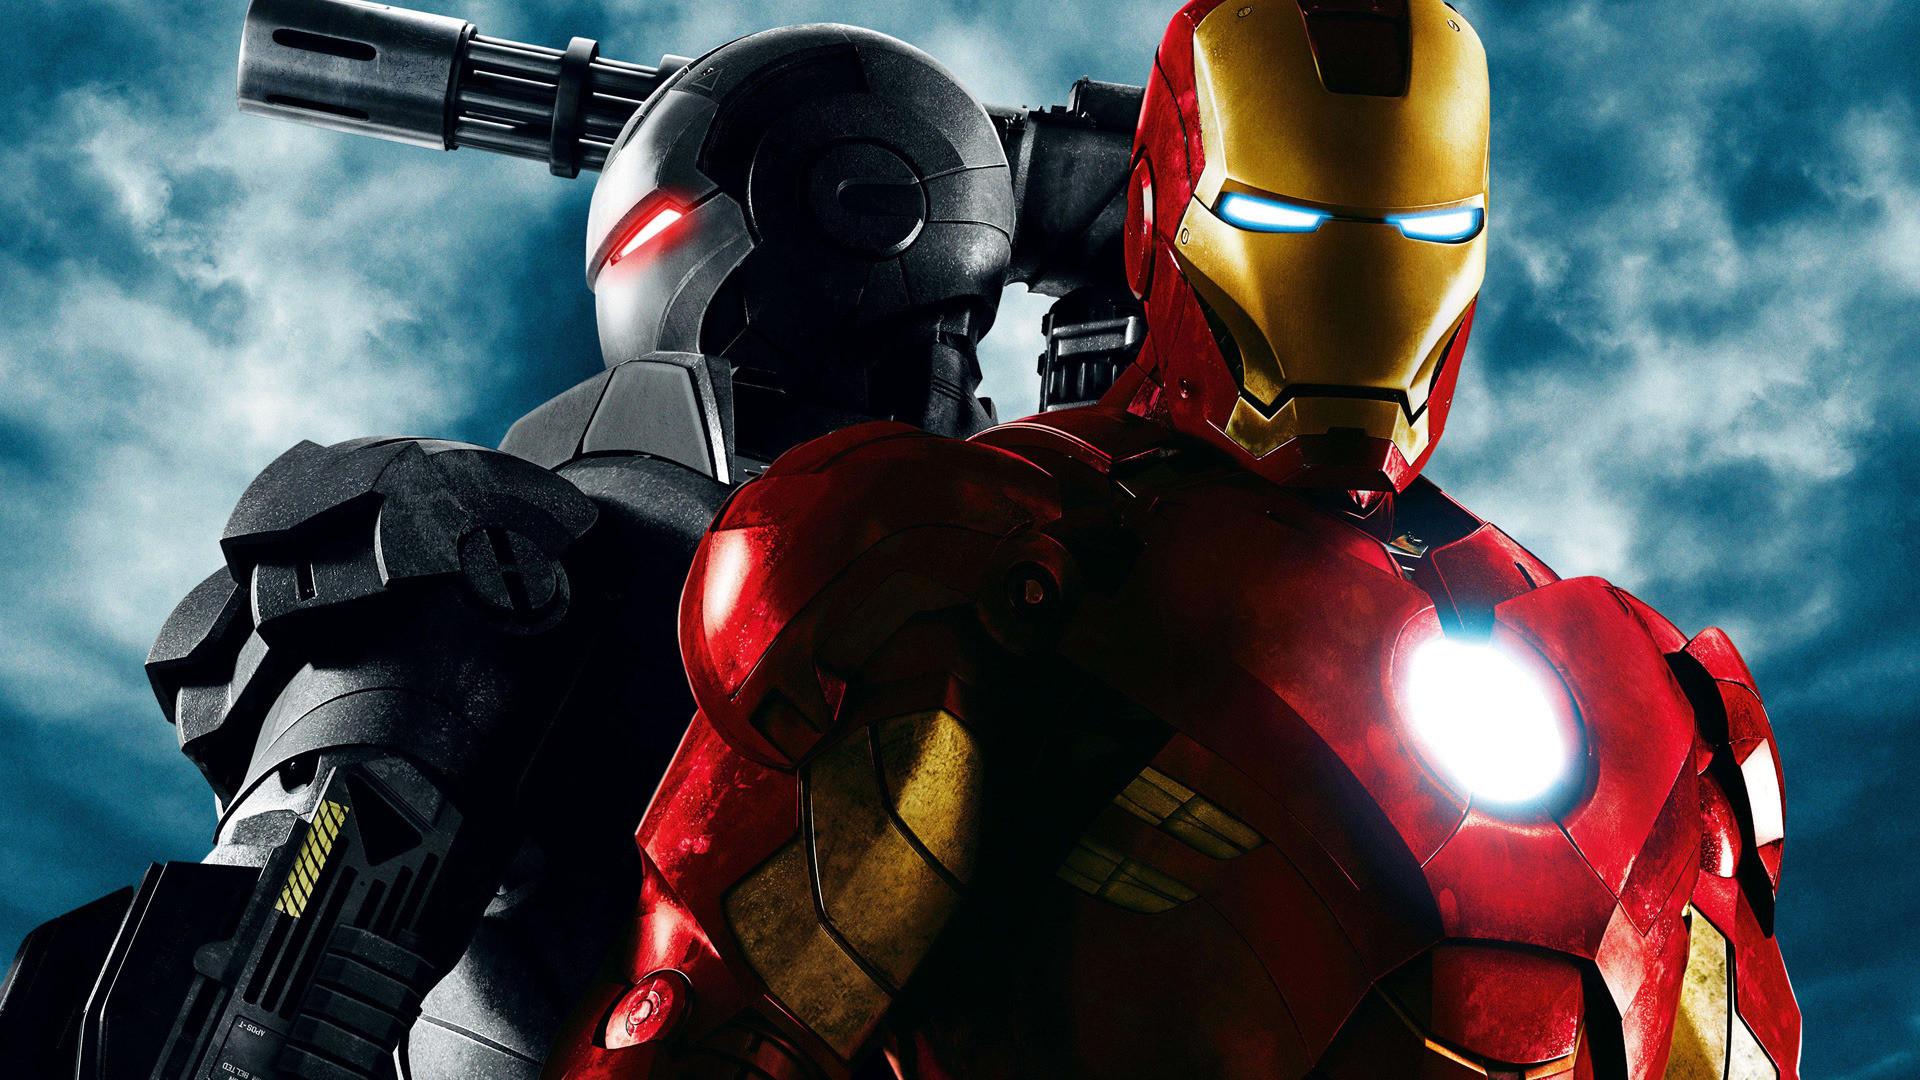 Iron Man 3 Hd 5592 Wallpaper